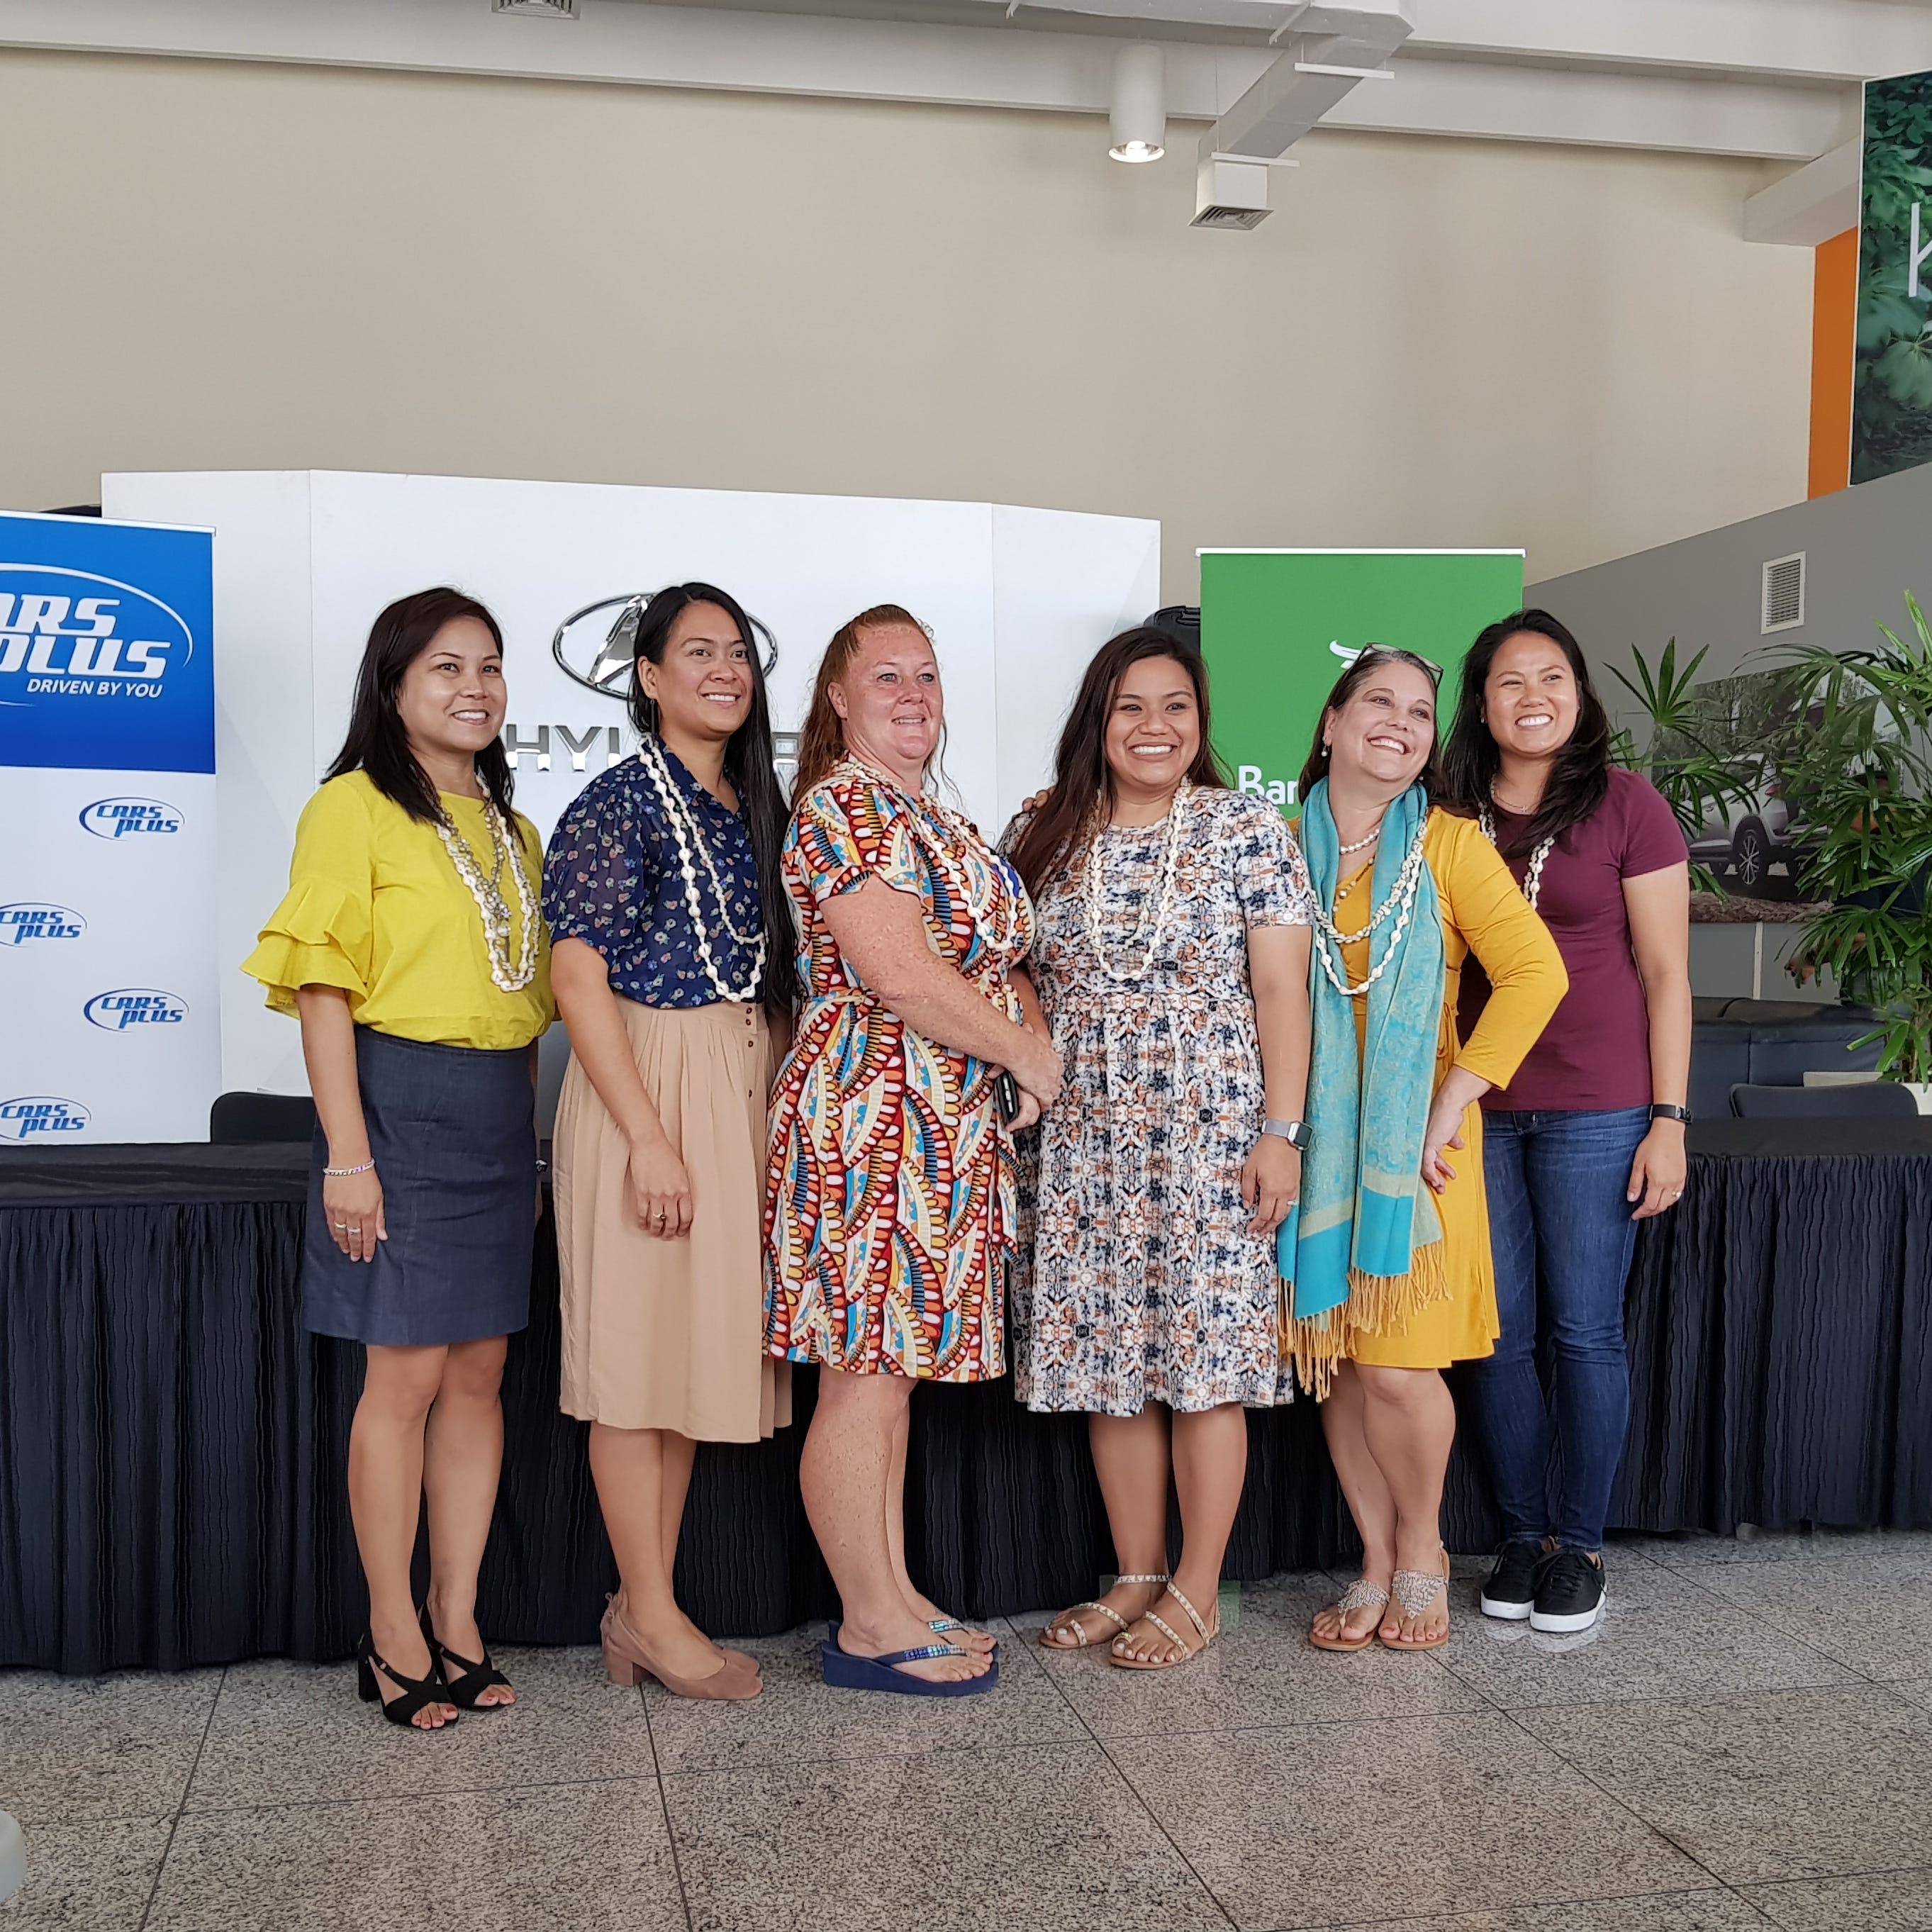 Meet Guam's 2019 Teacher of the Year: Analyn Palugod of Adacao Elementary School